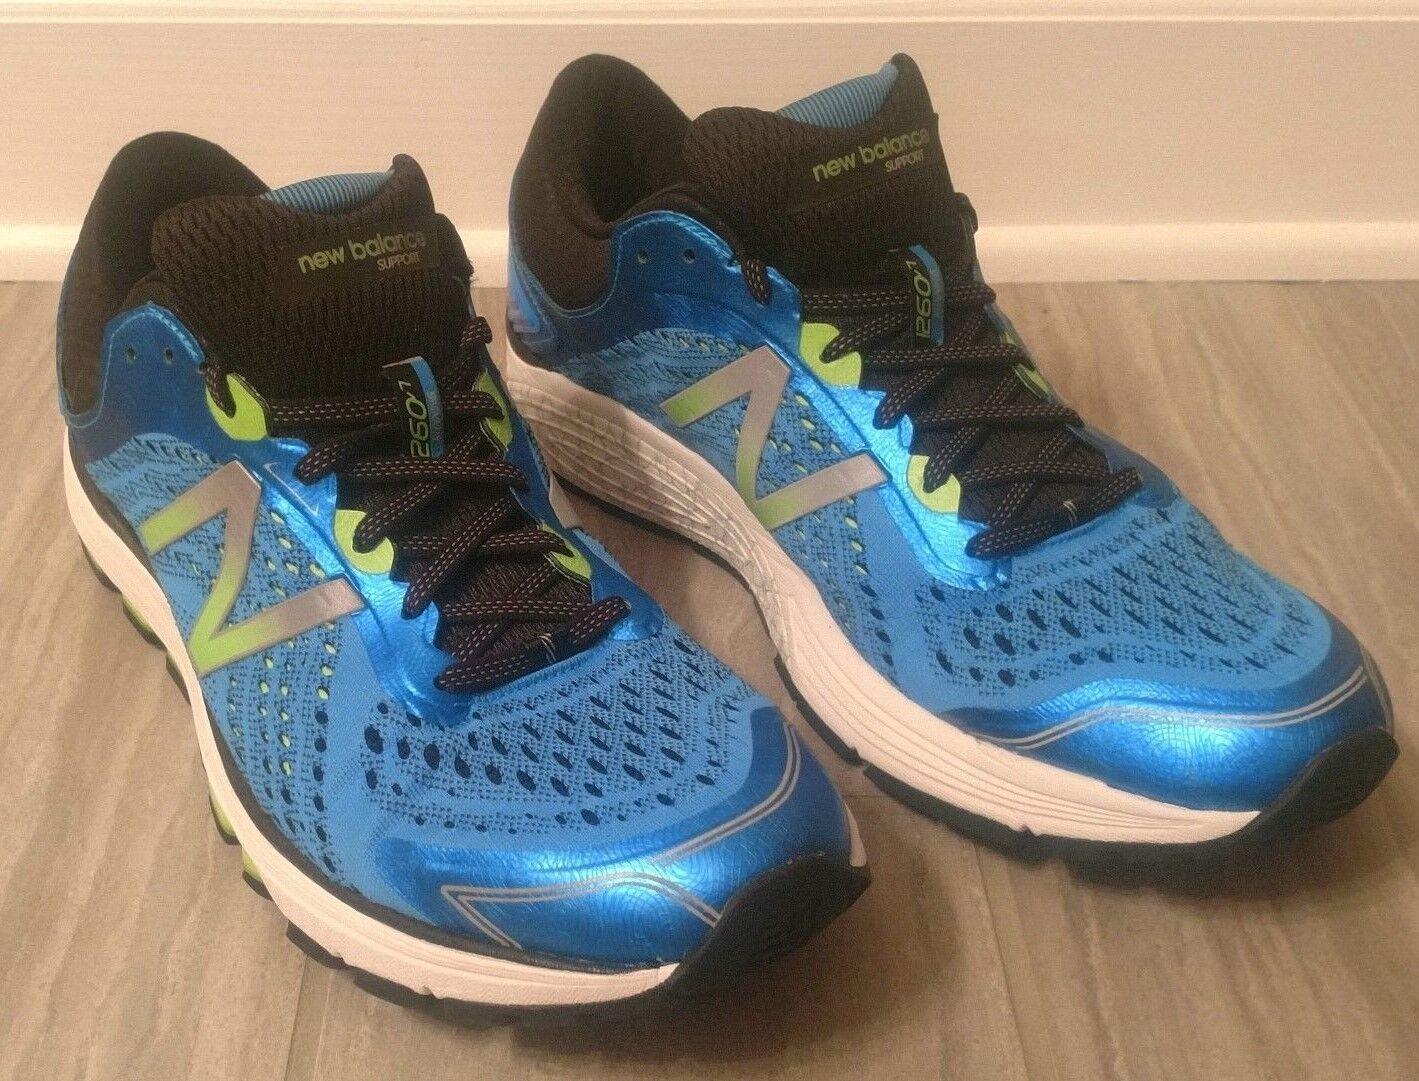 NEW para hombre 1260v7 Azul BALANCE verde Correr Traininng Zapatos  tamaño  12.5D